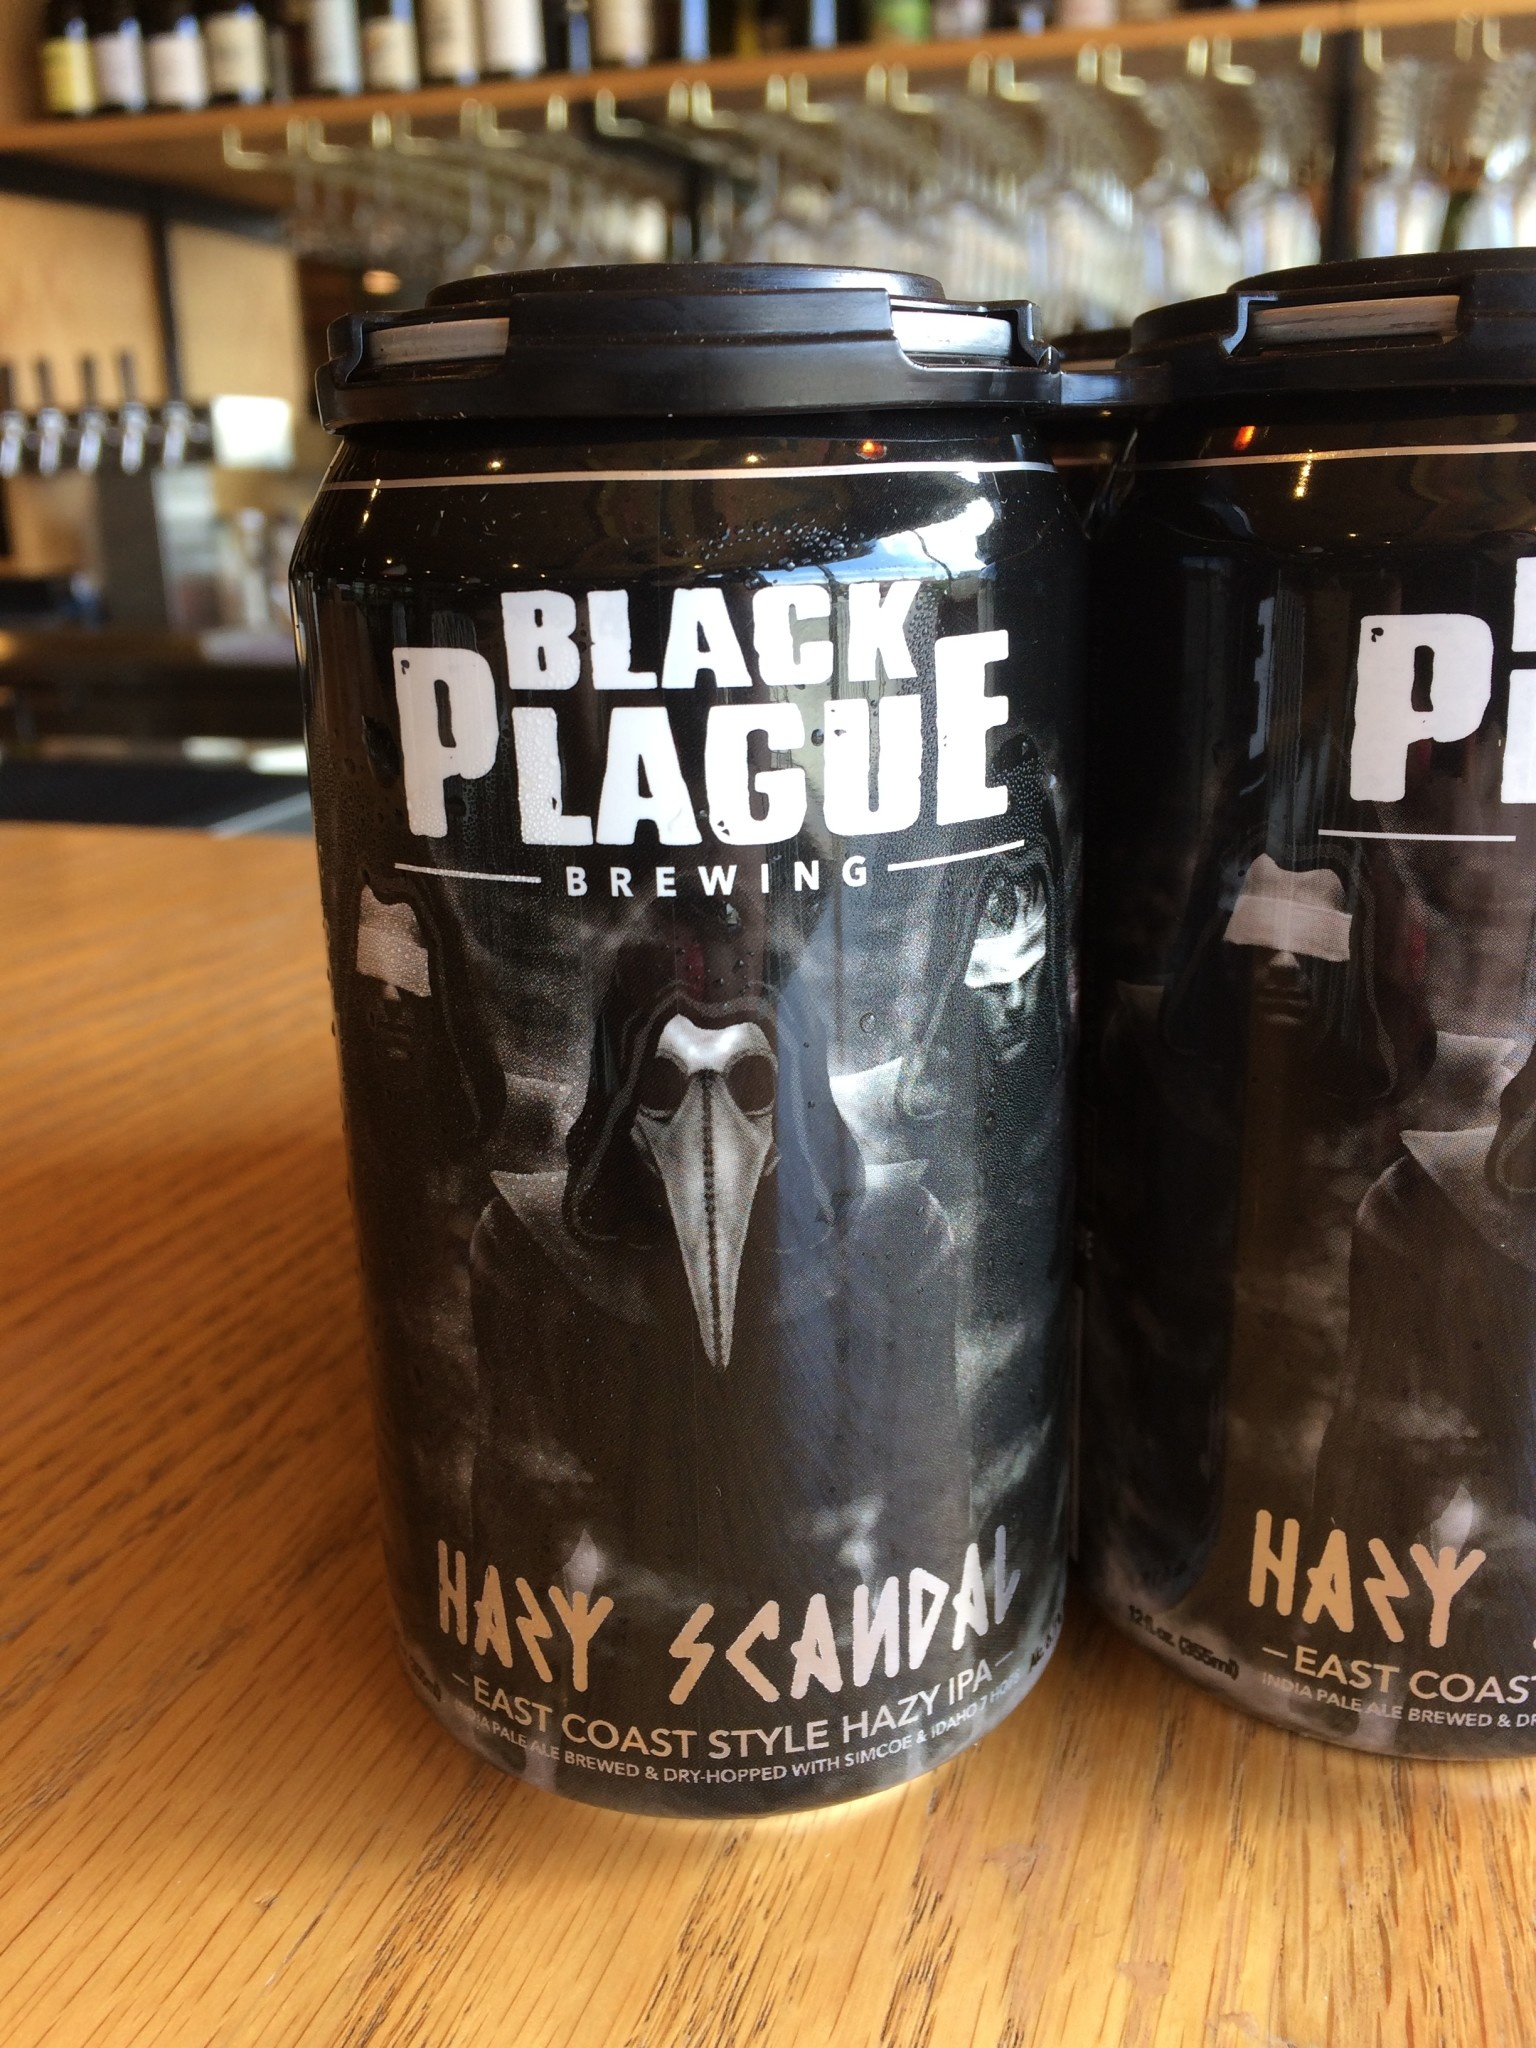 Black Plague Brewing Black Plague Brewing Hazy Scandal IPA 12oz 6pk